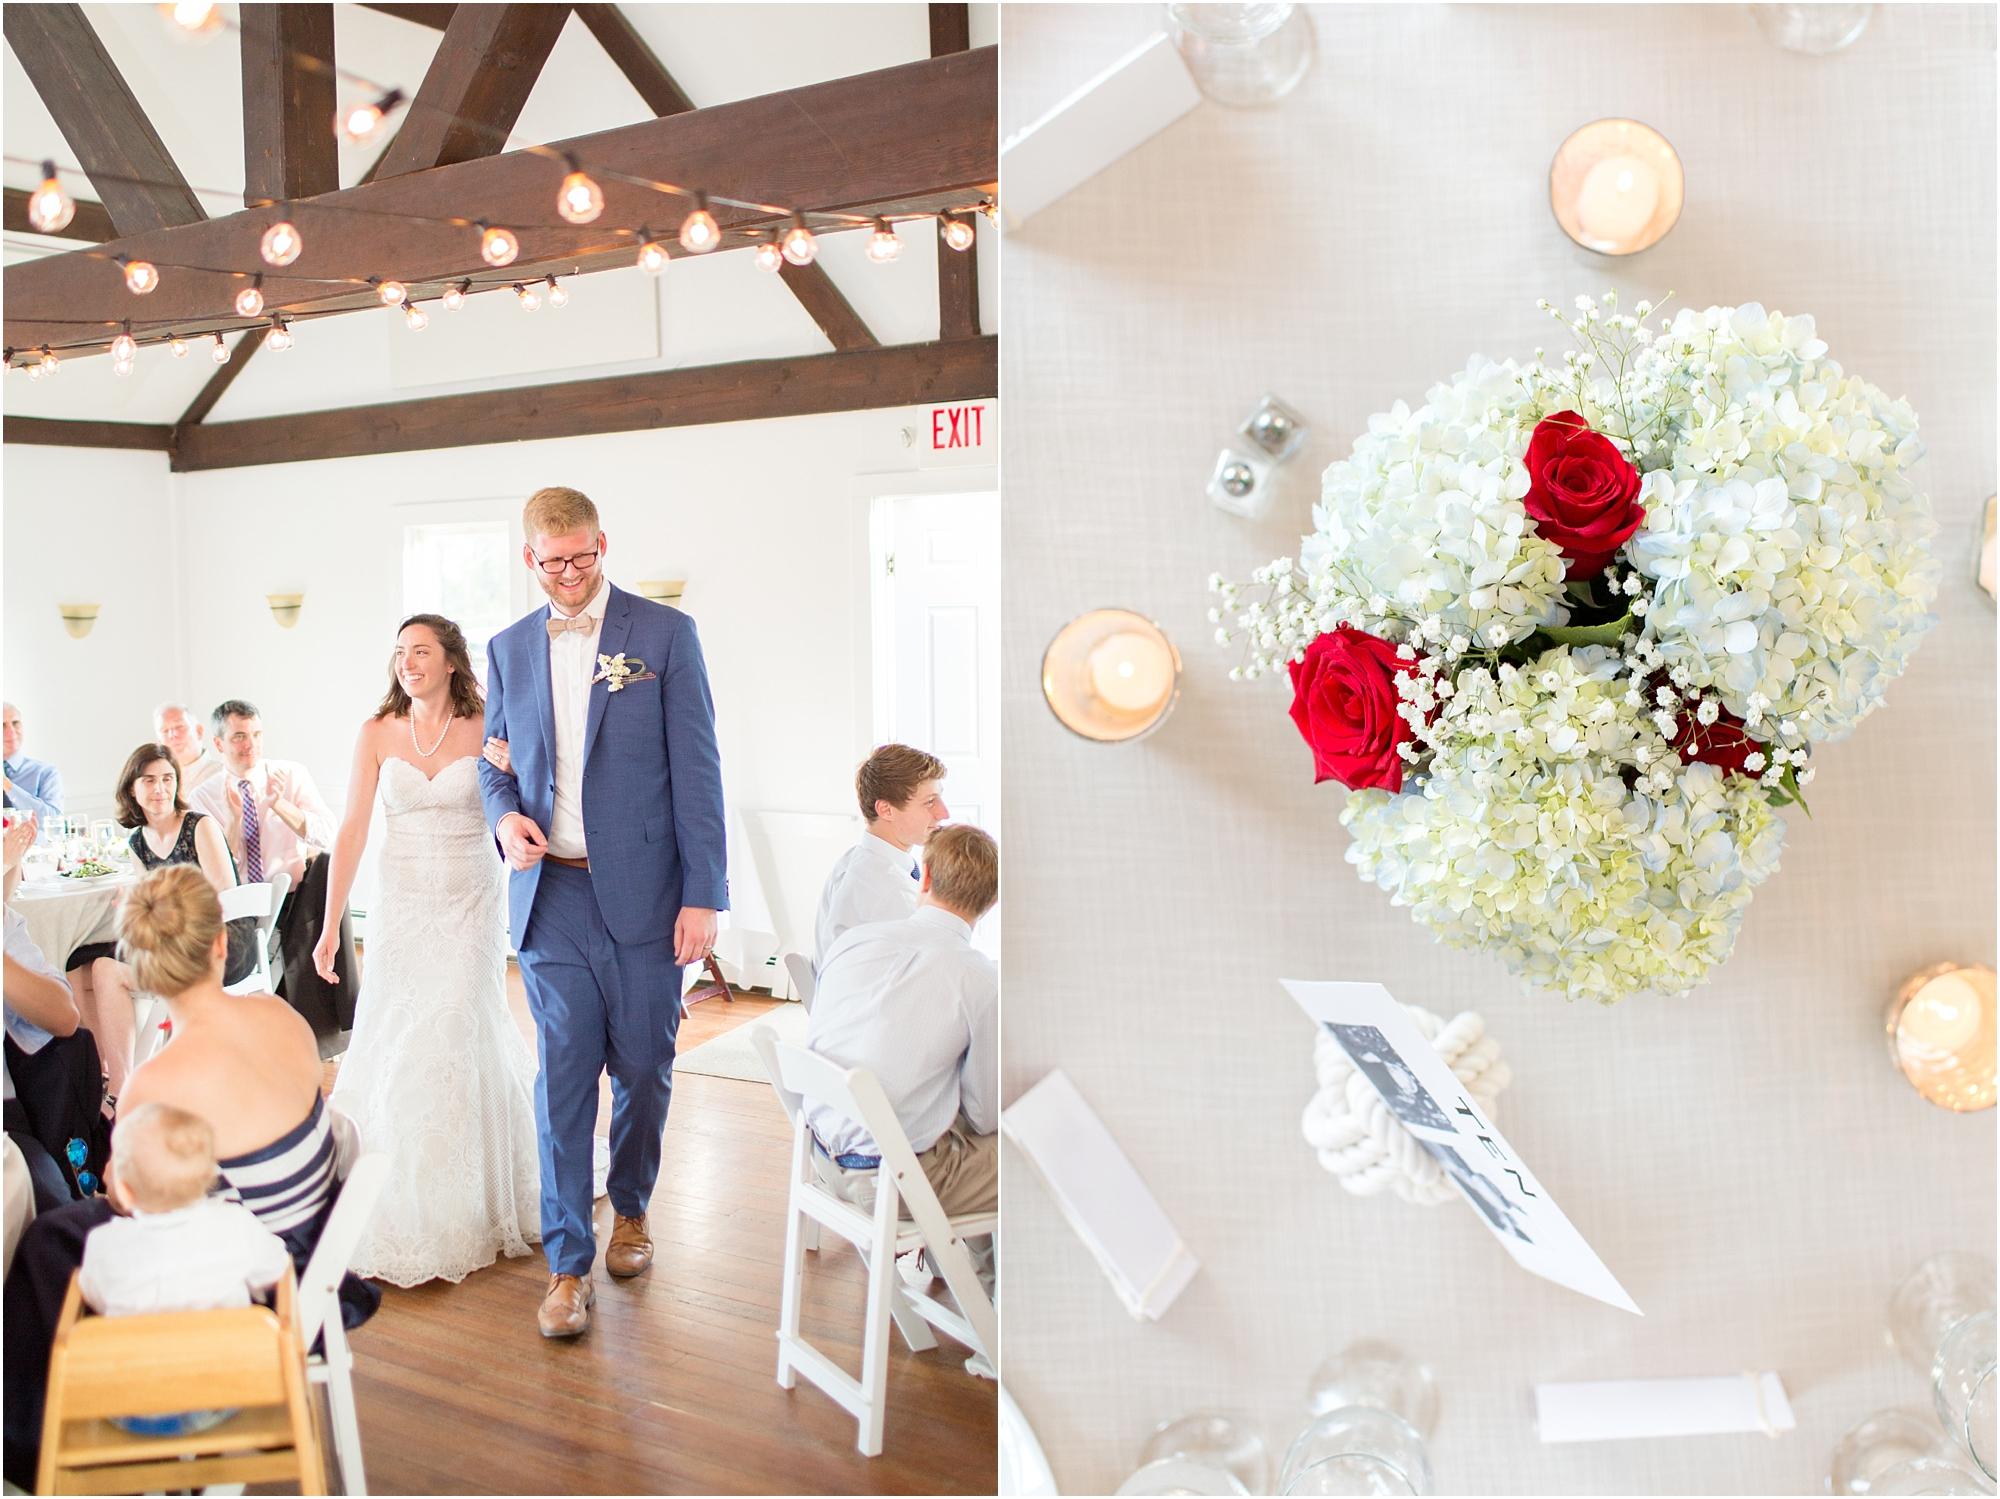 Goodman 7-Reception-913_anna grace photography wellfleet cape cod massachusetts destination wedding photographer Chequessett Yacht and Country Club wedding photo.jpg